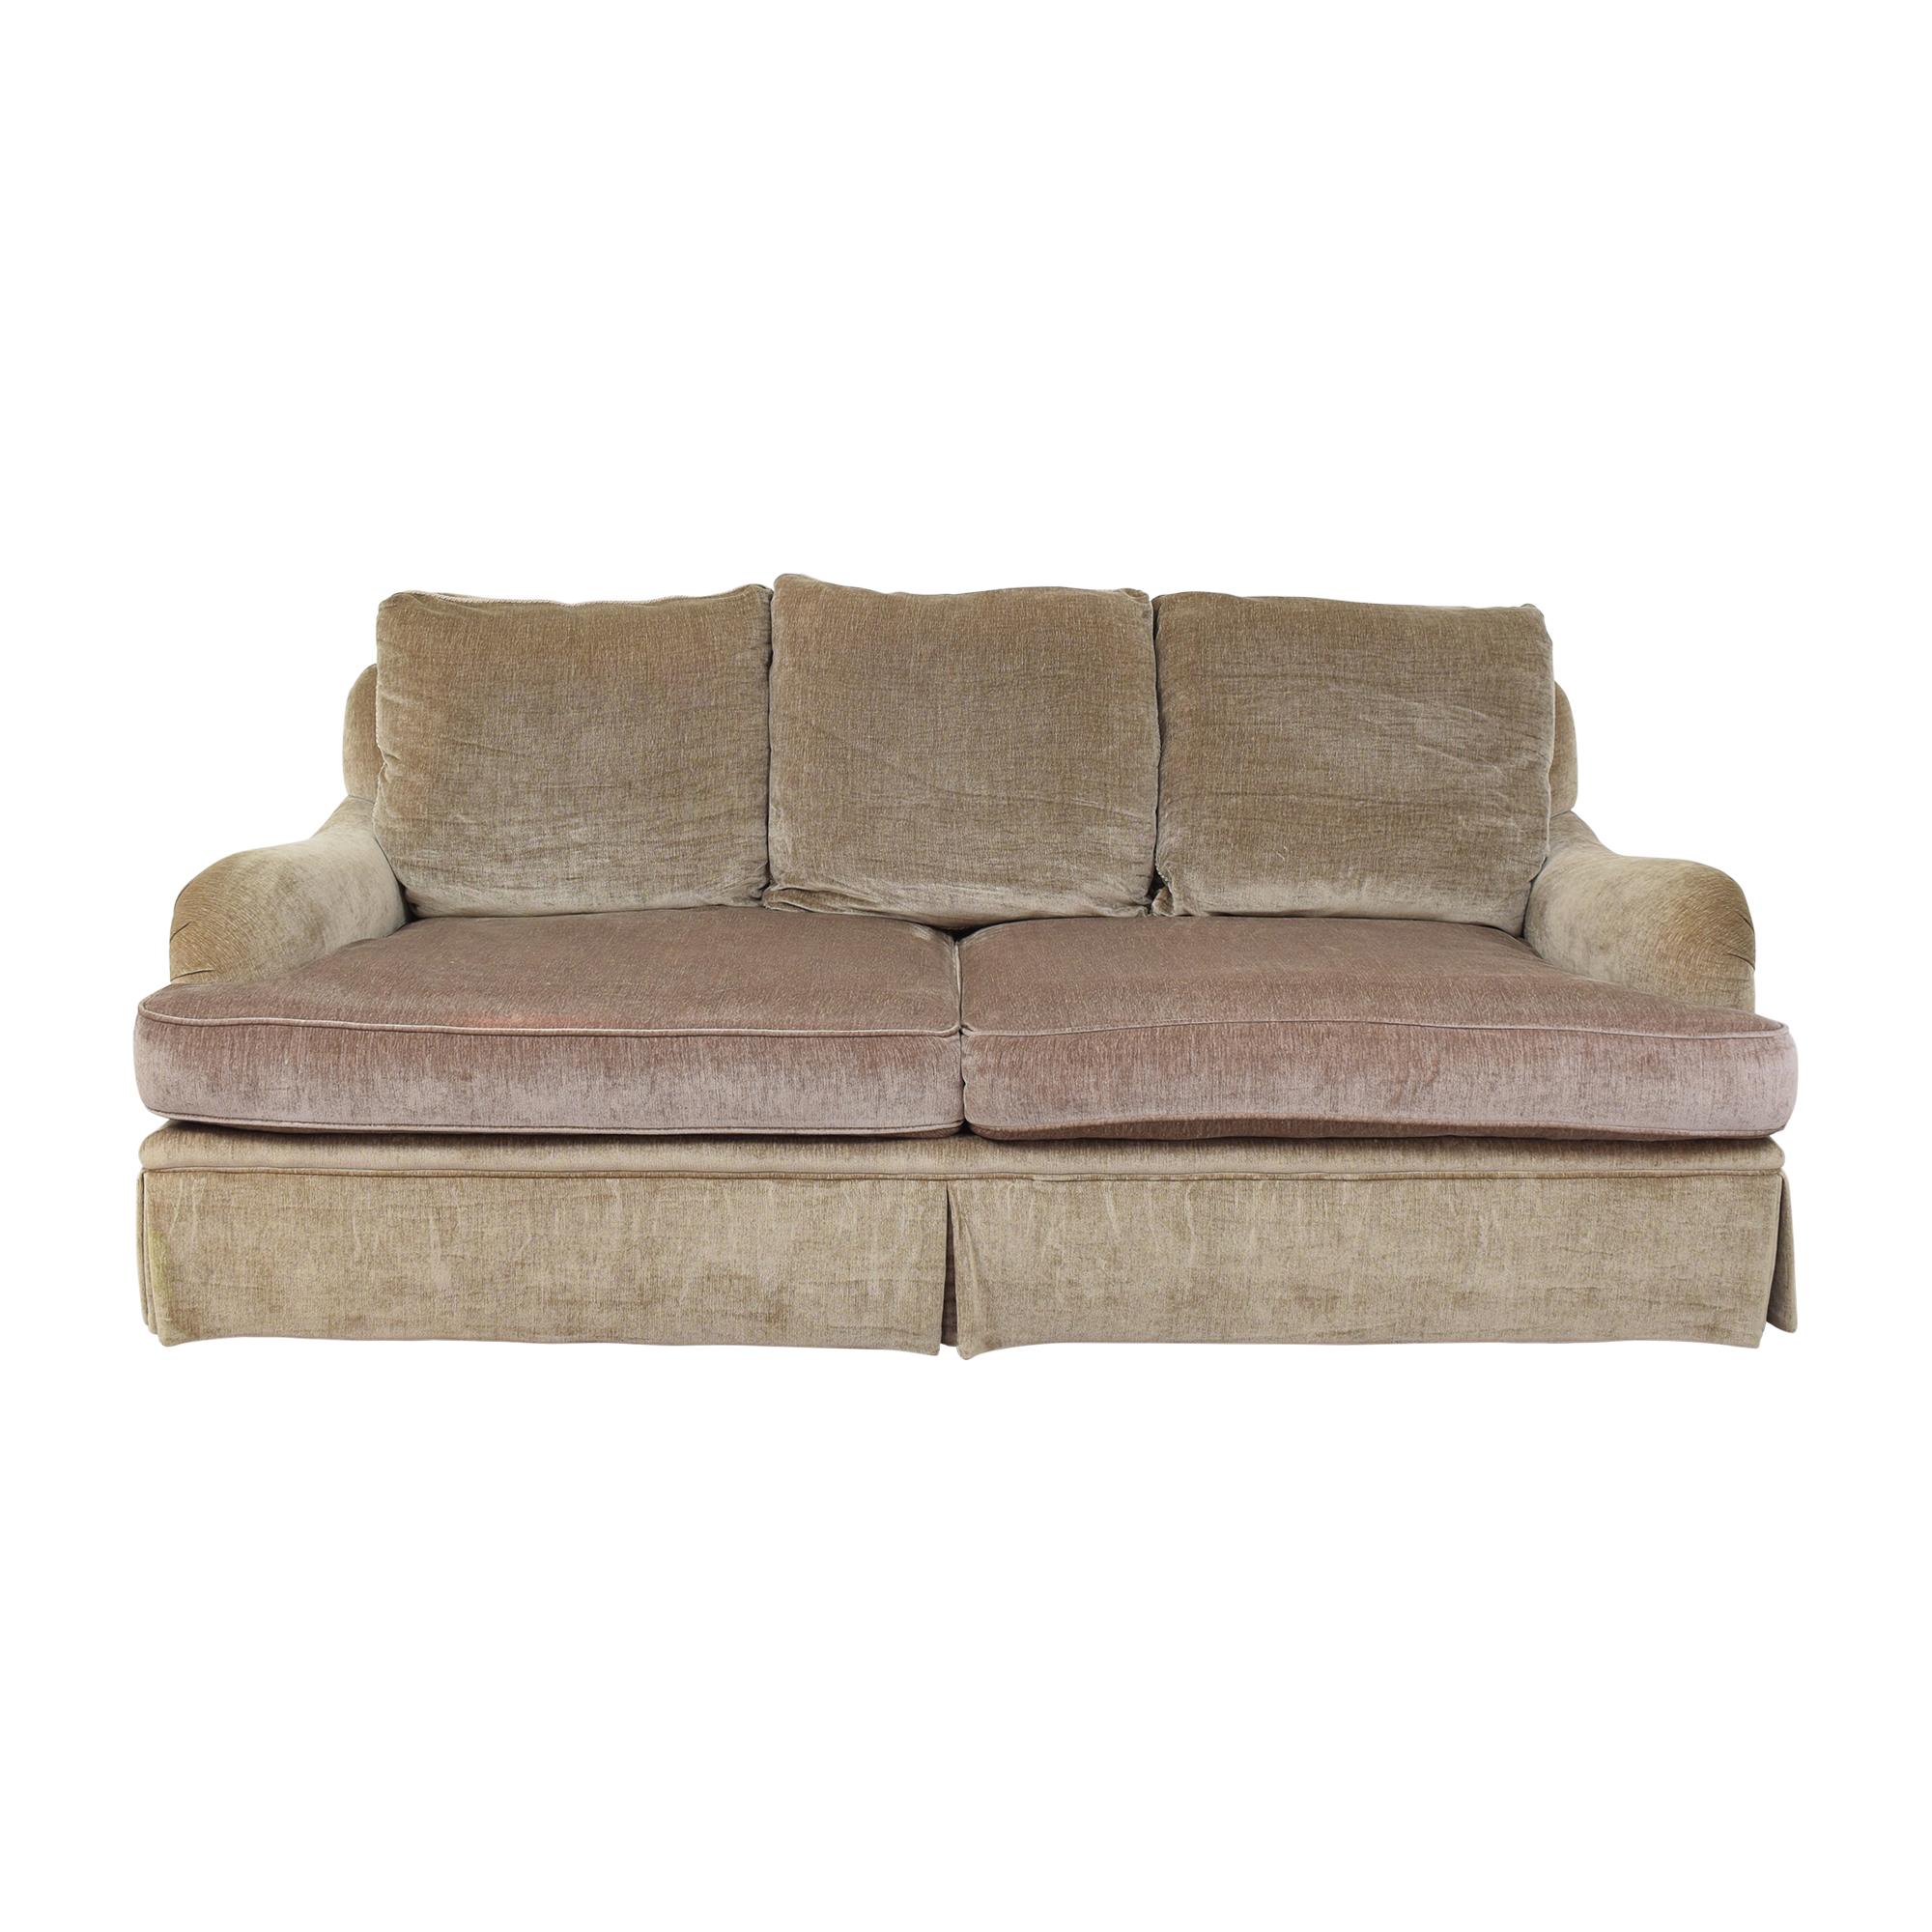 shop Custom Two Cushion Sofa